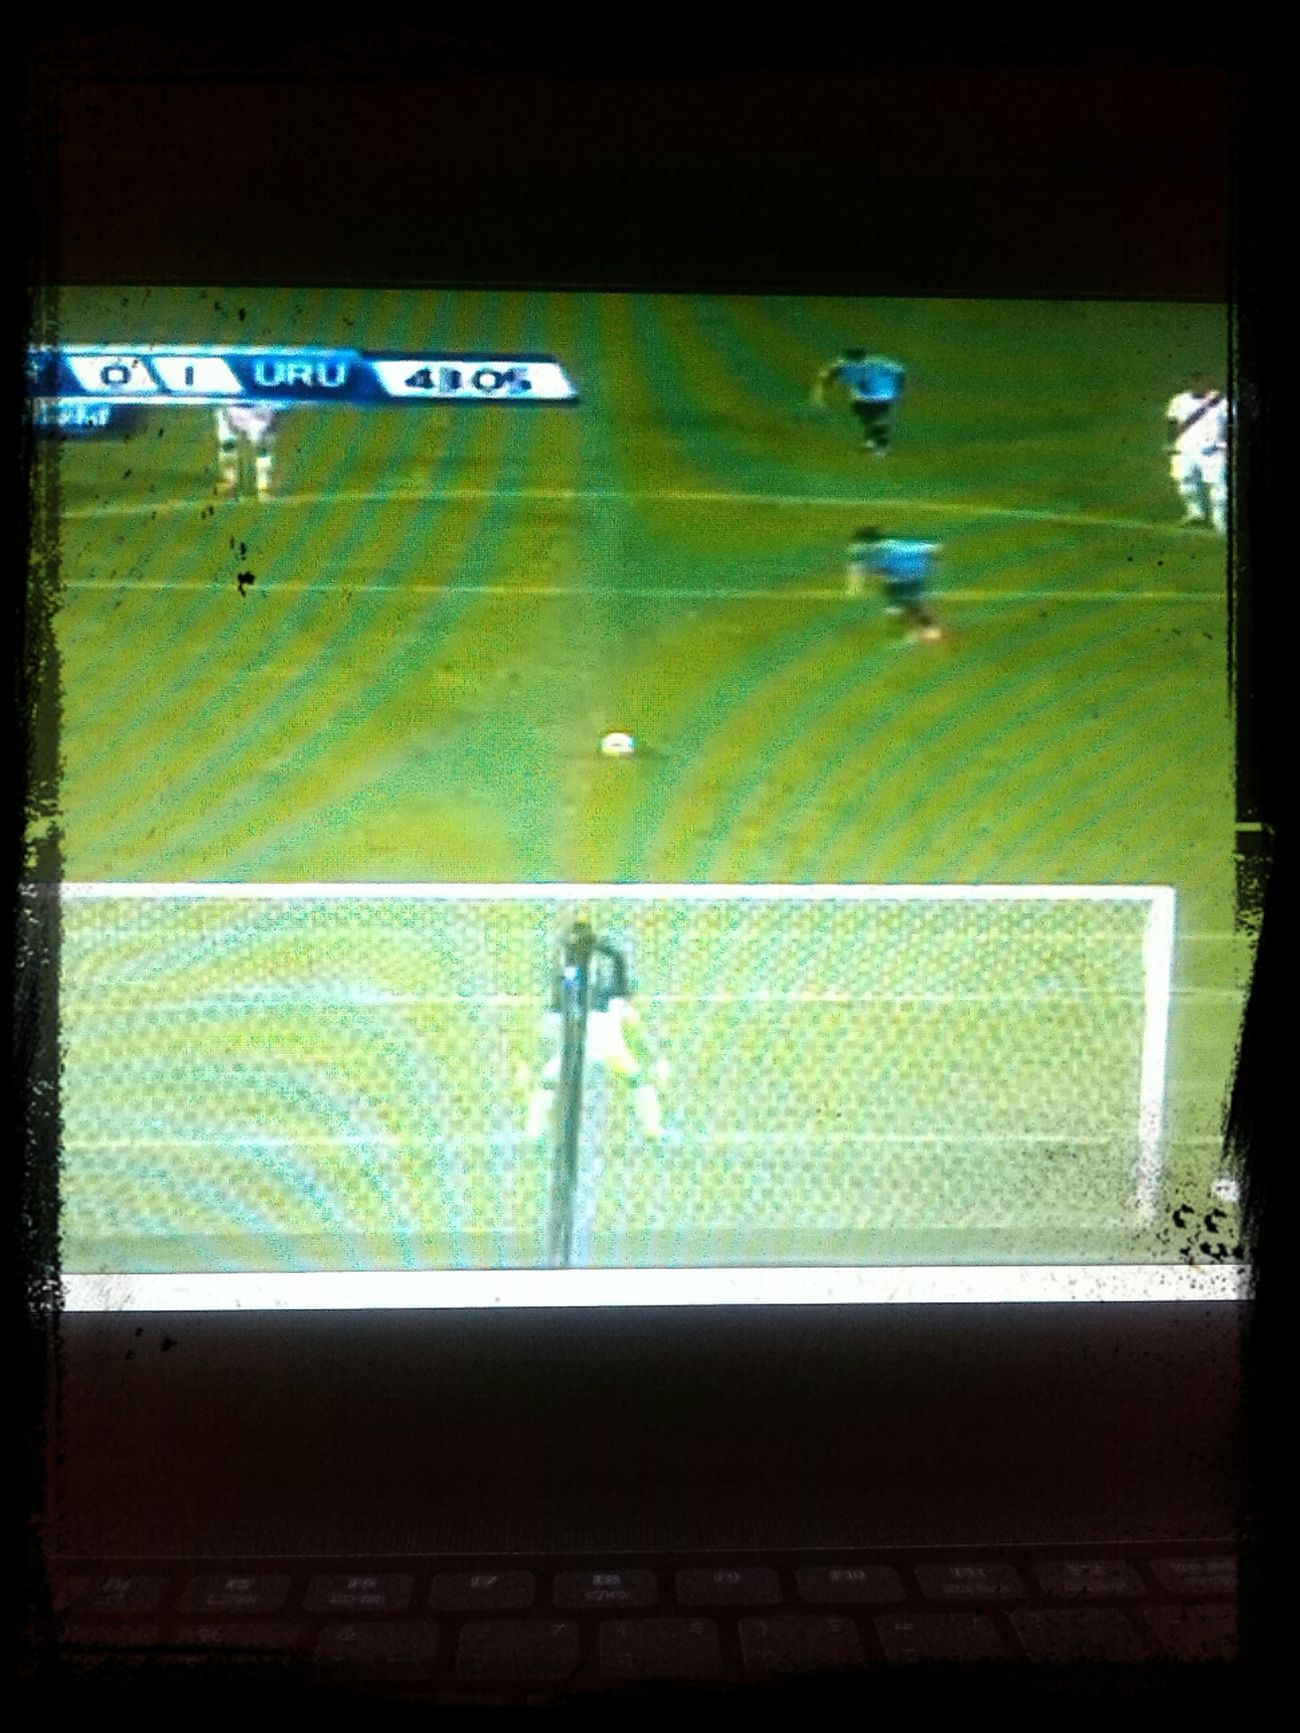 Uruguay Luis Suarez Göl Eliminatorias